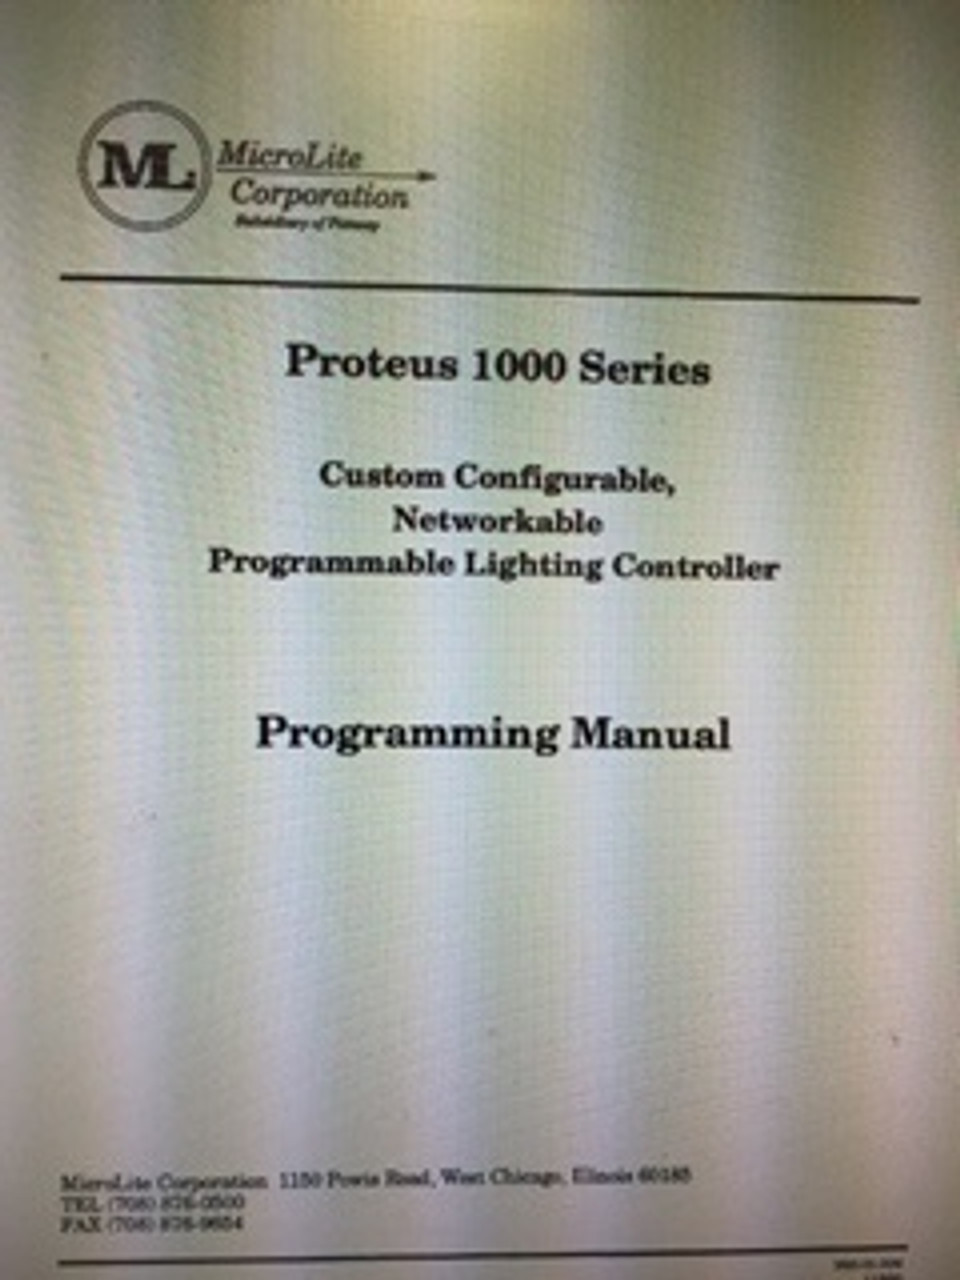 MicroLite Proteus 1000 Series Manual